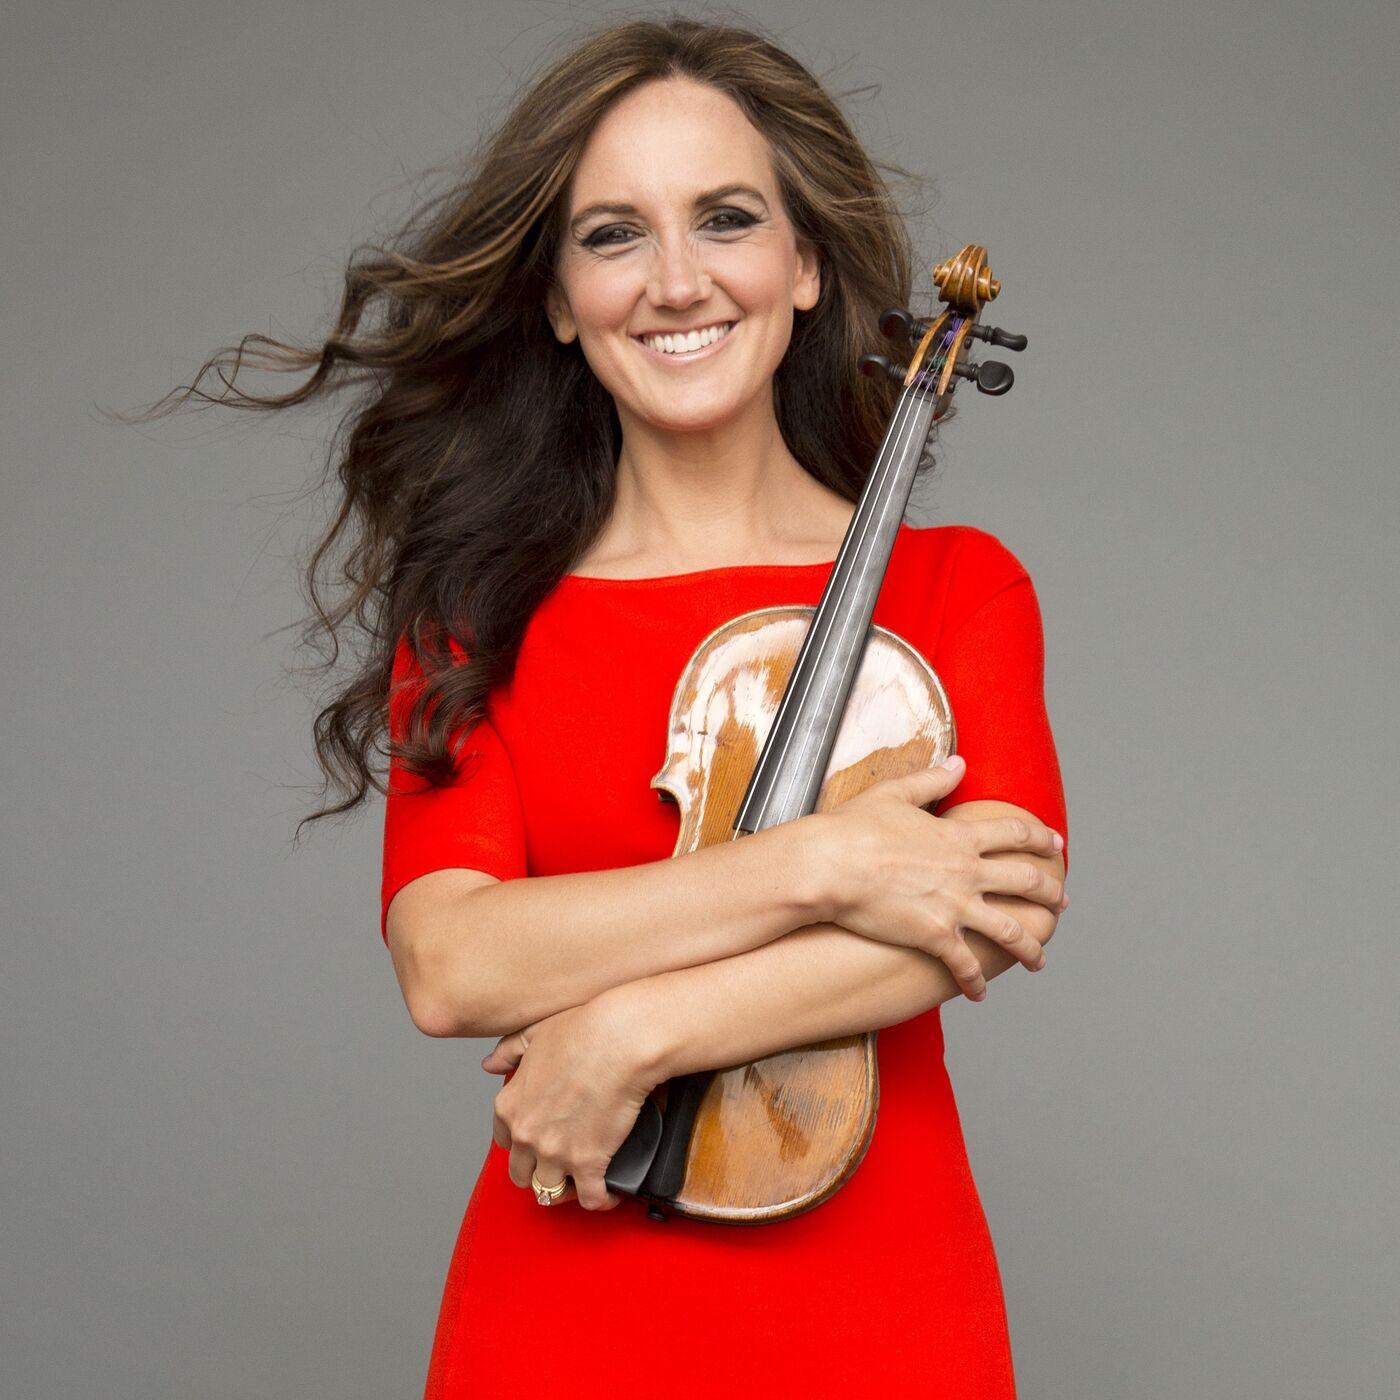 Episode 4 — Jenny Oaks Baker — World Renowned Violinist, Wife, Mother, Christian